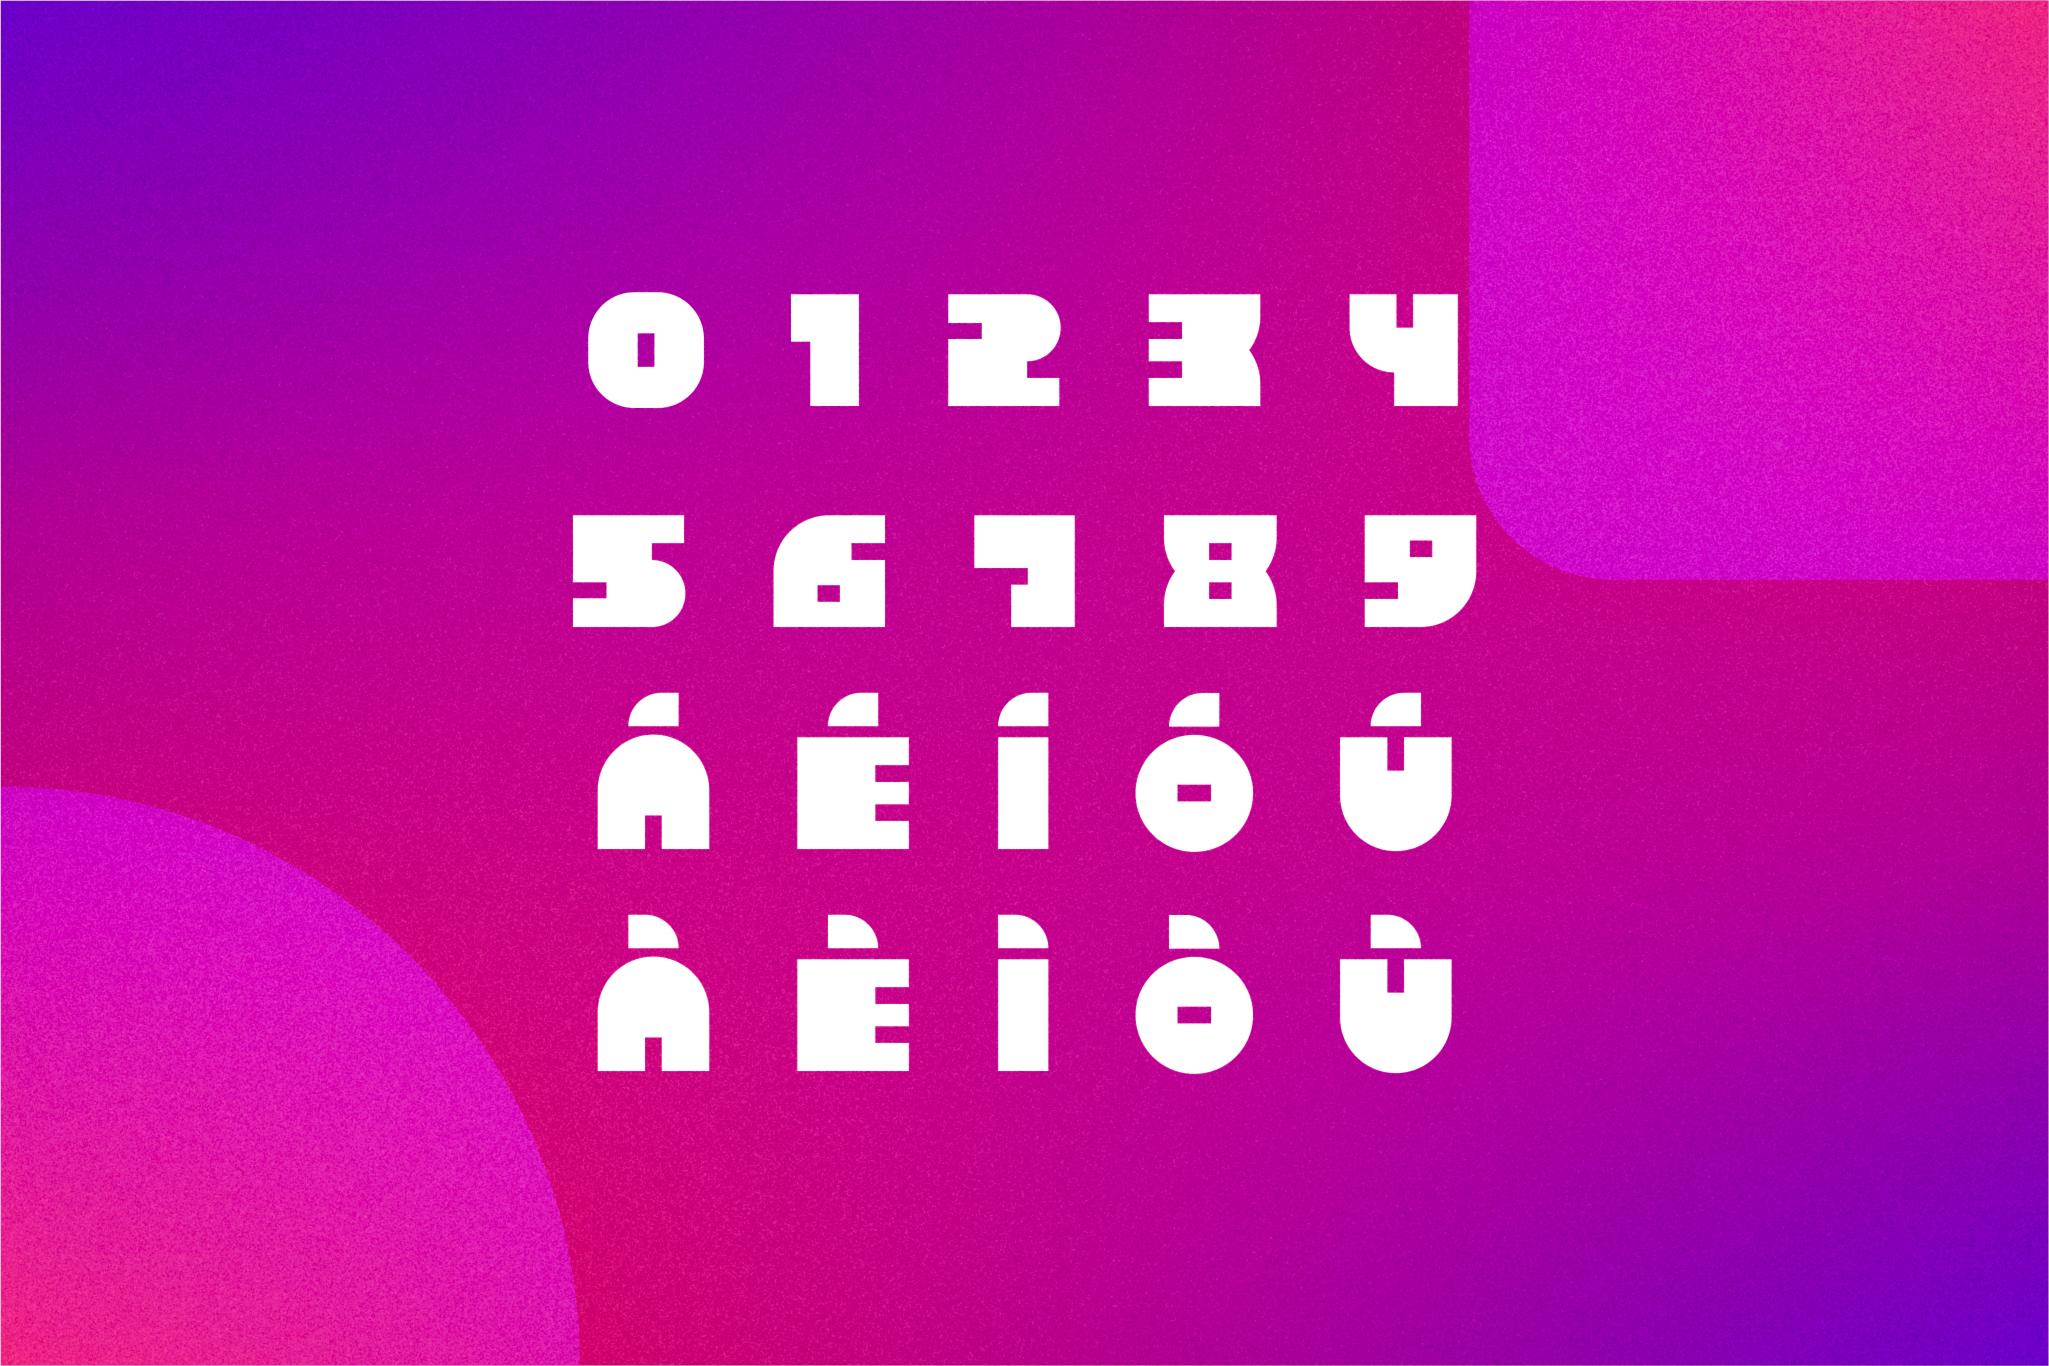 SQUAROUND S example image 5